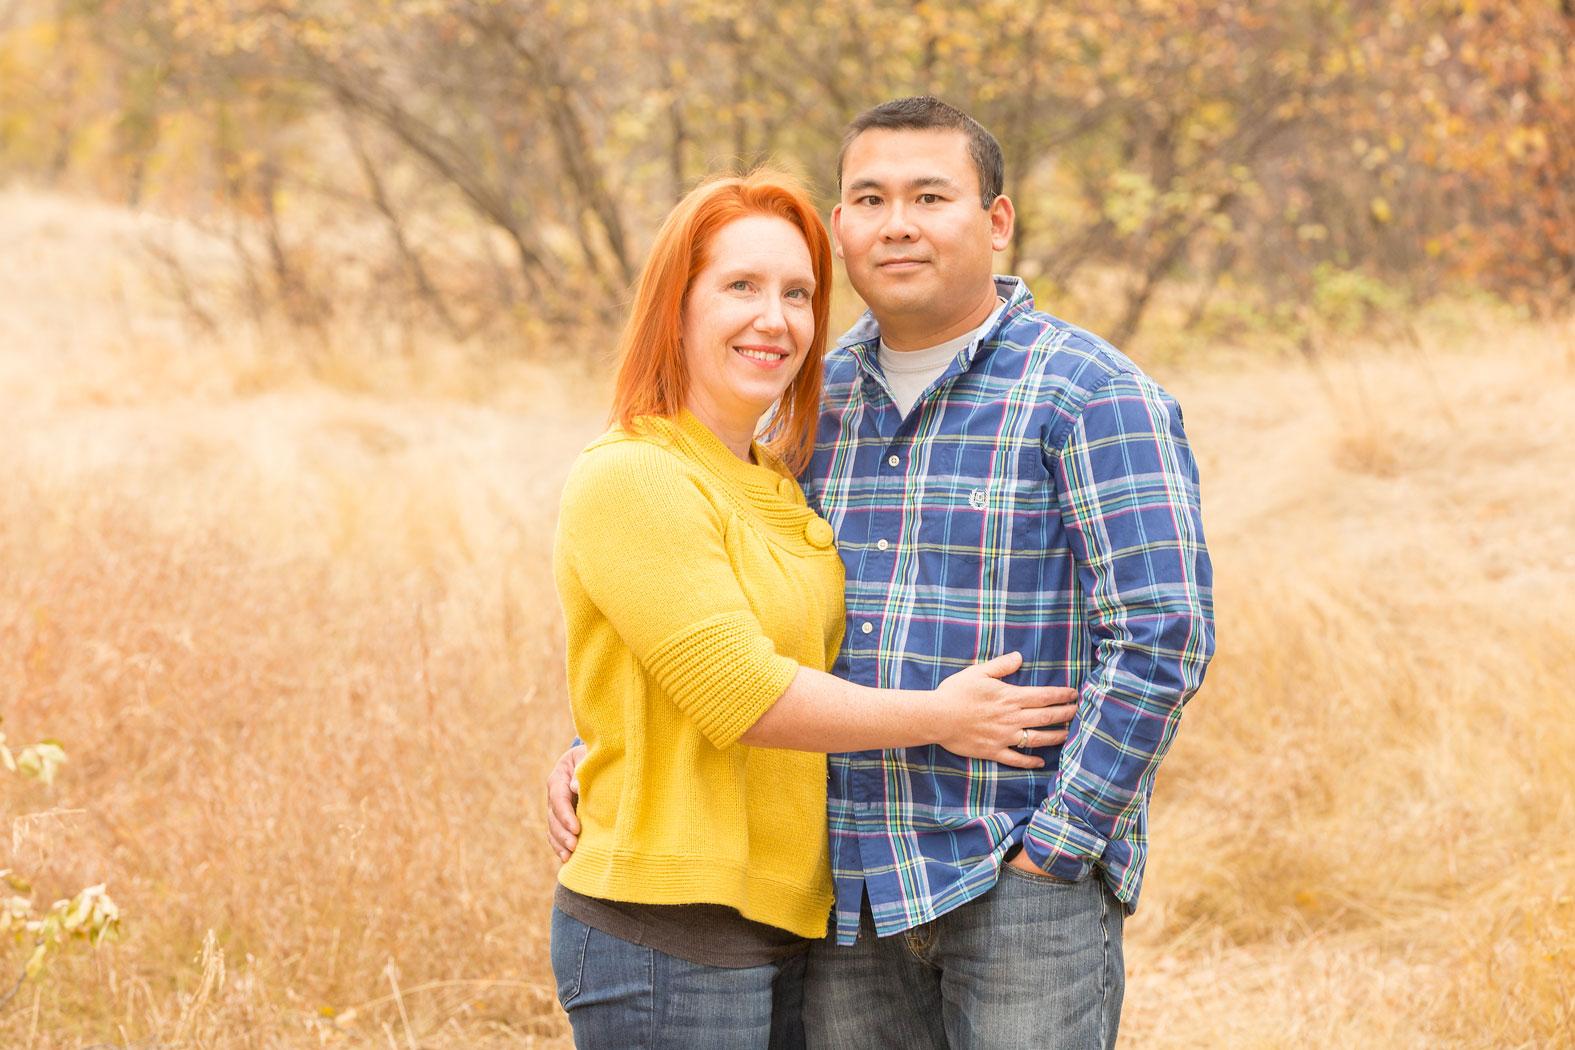 Fall_Photography_Lethbridge_Couples